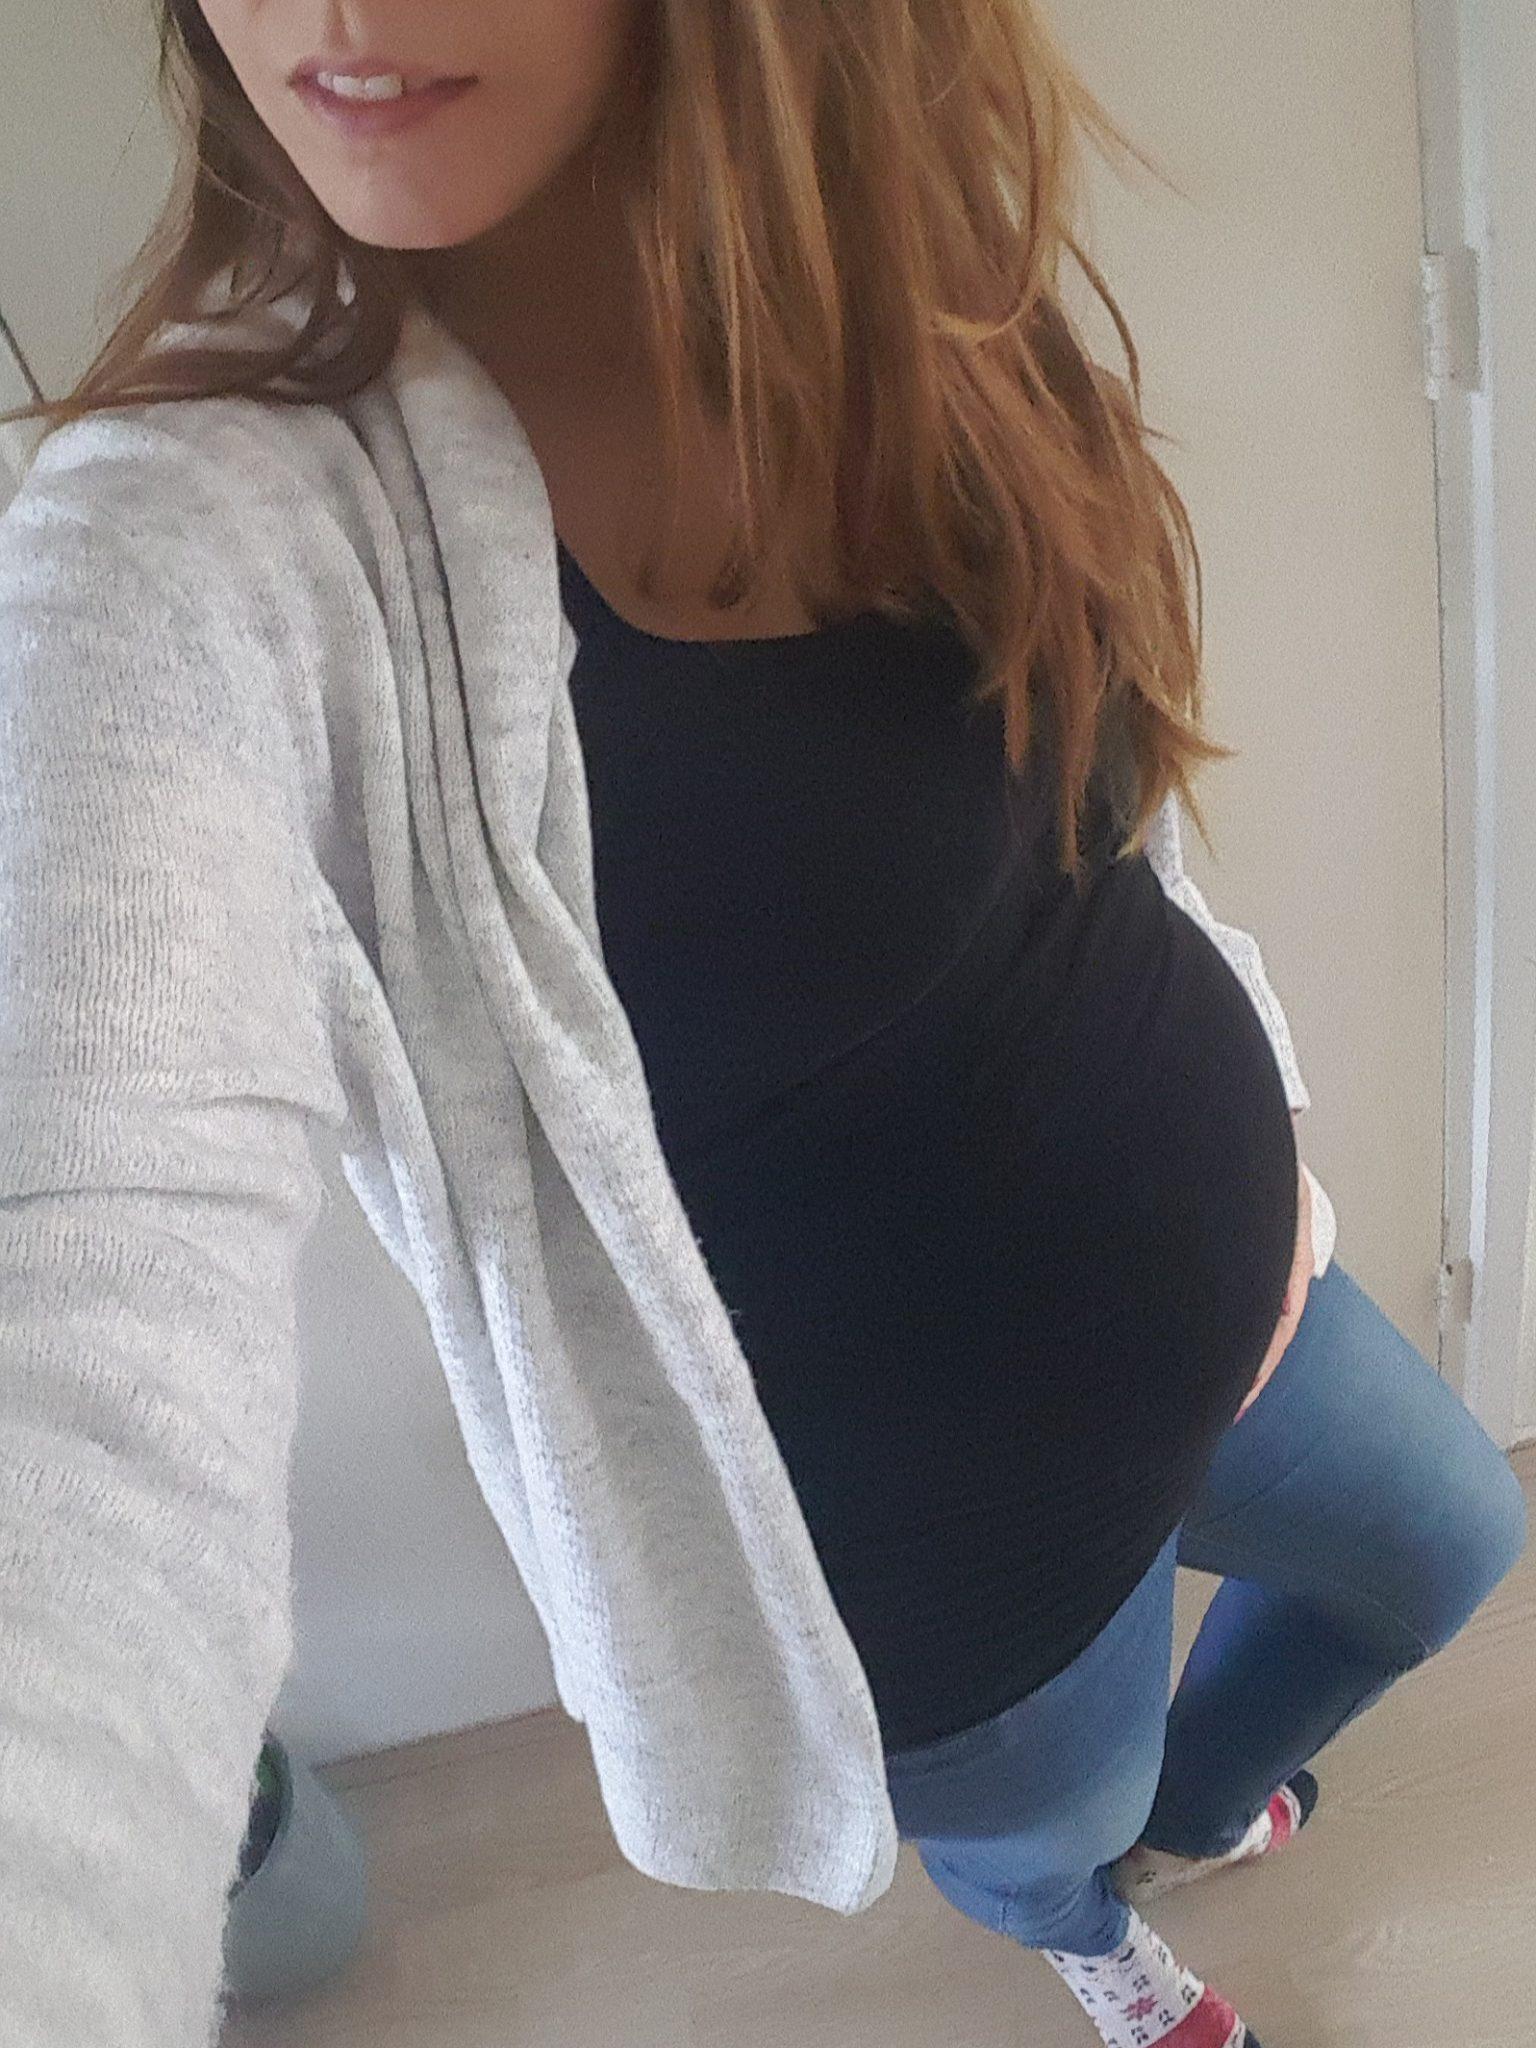 Mommy Monday: zwangerschapsupdate 30 weken zwanger